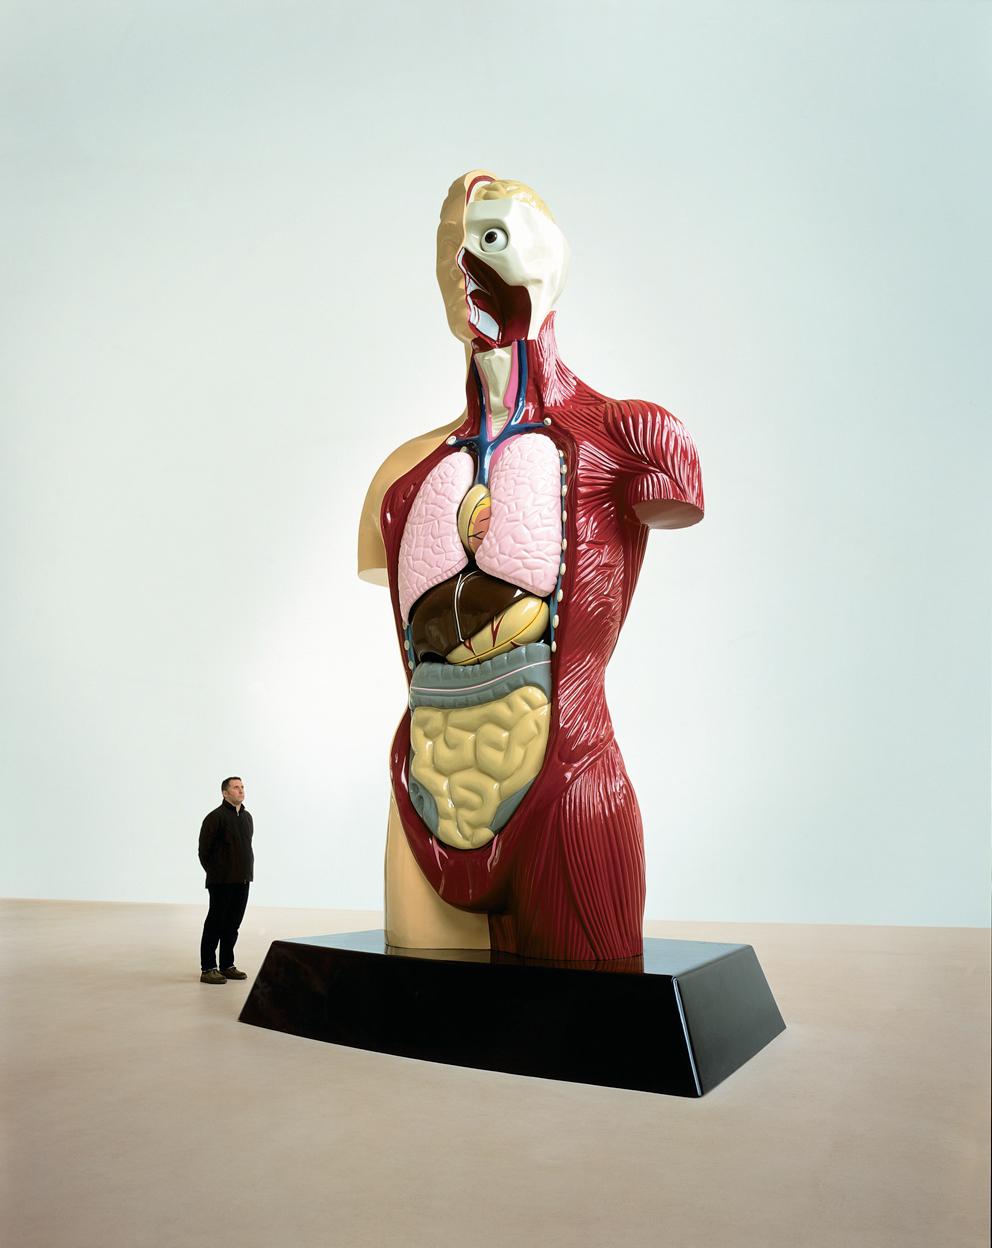 Damien Hirst courtesy Musée océanographique de Monaco